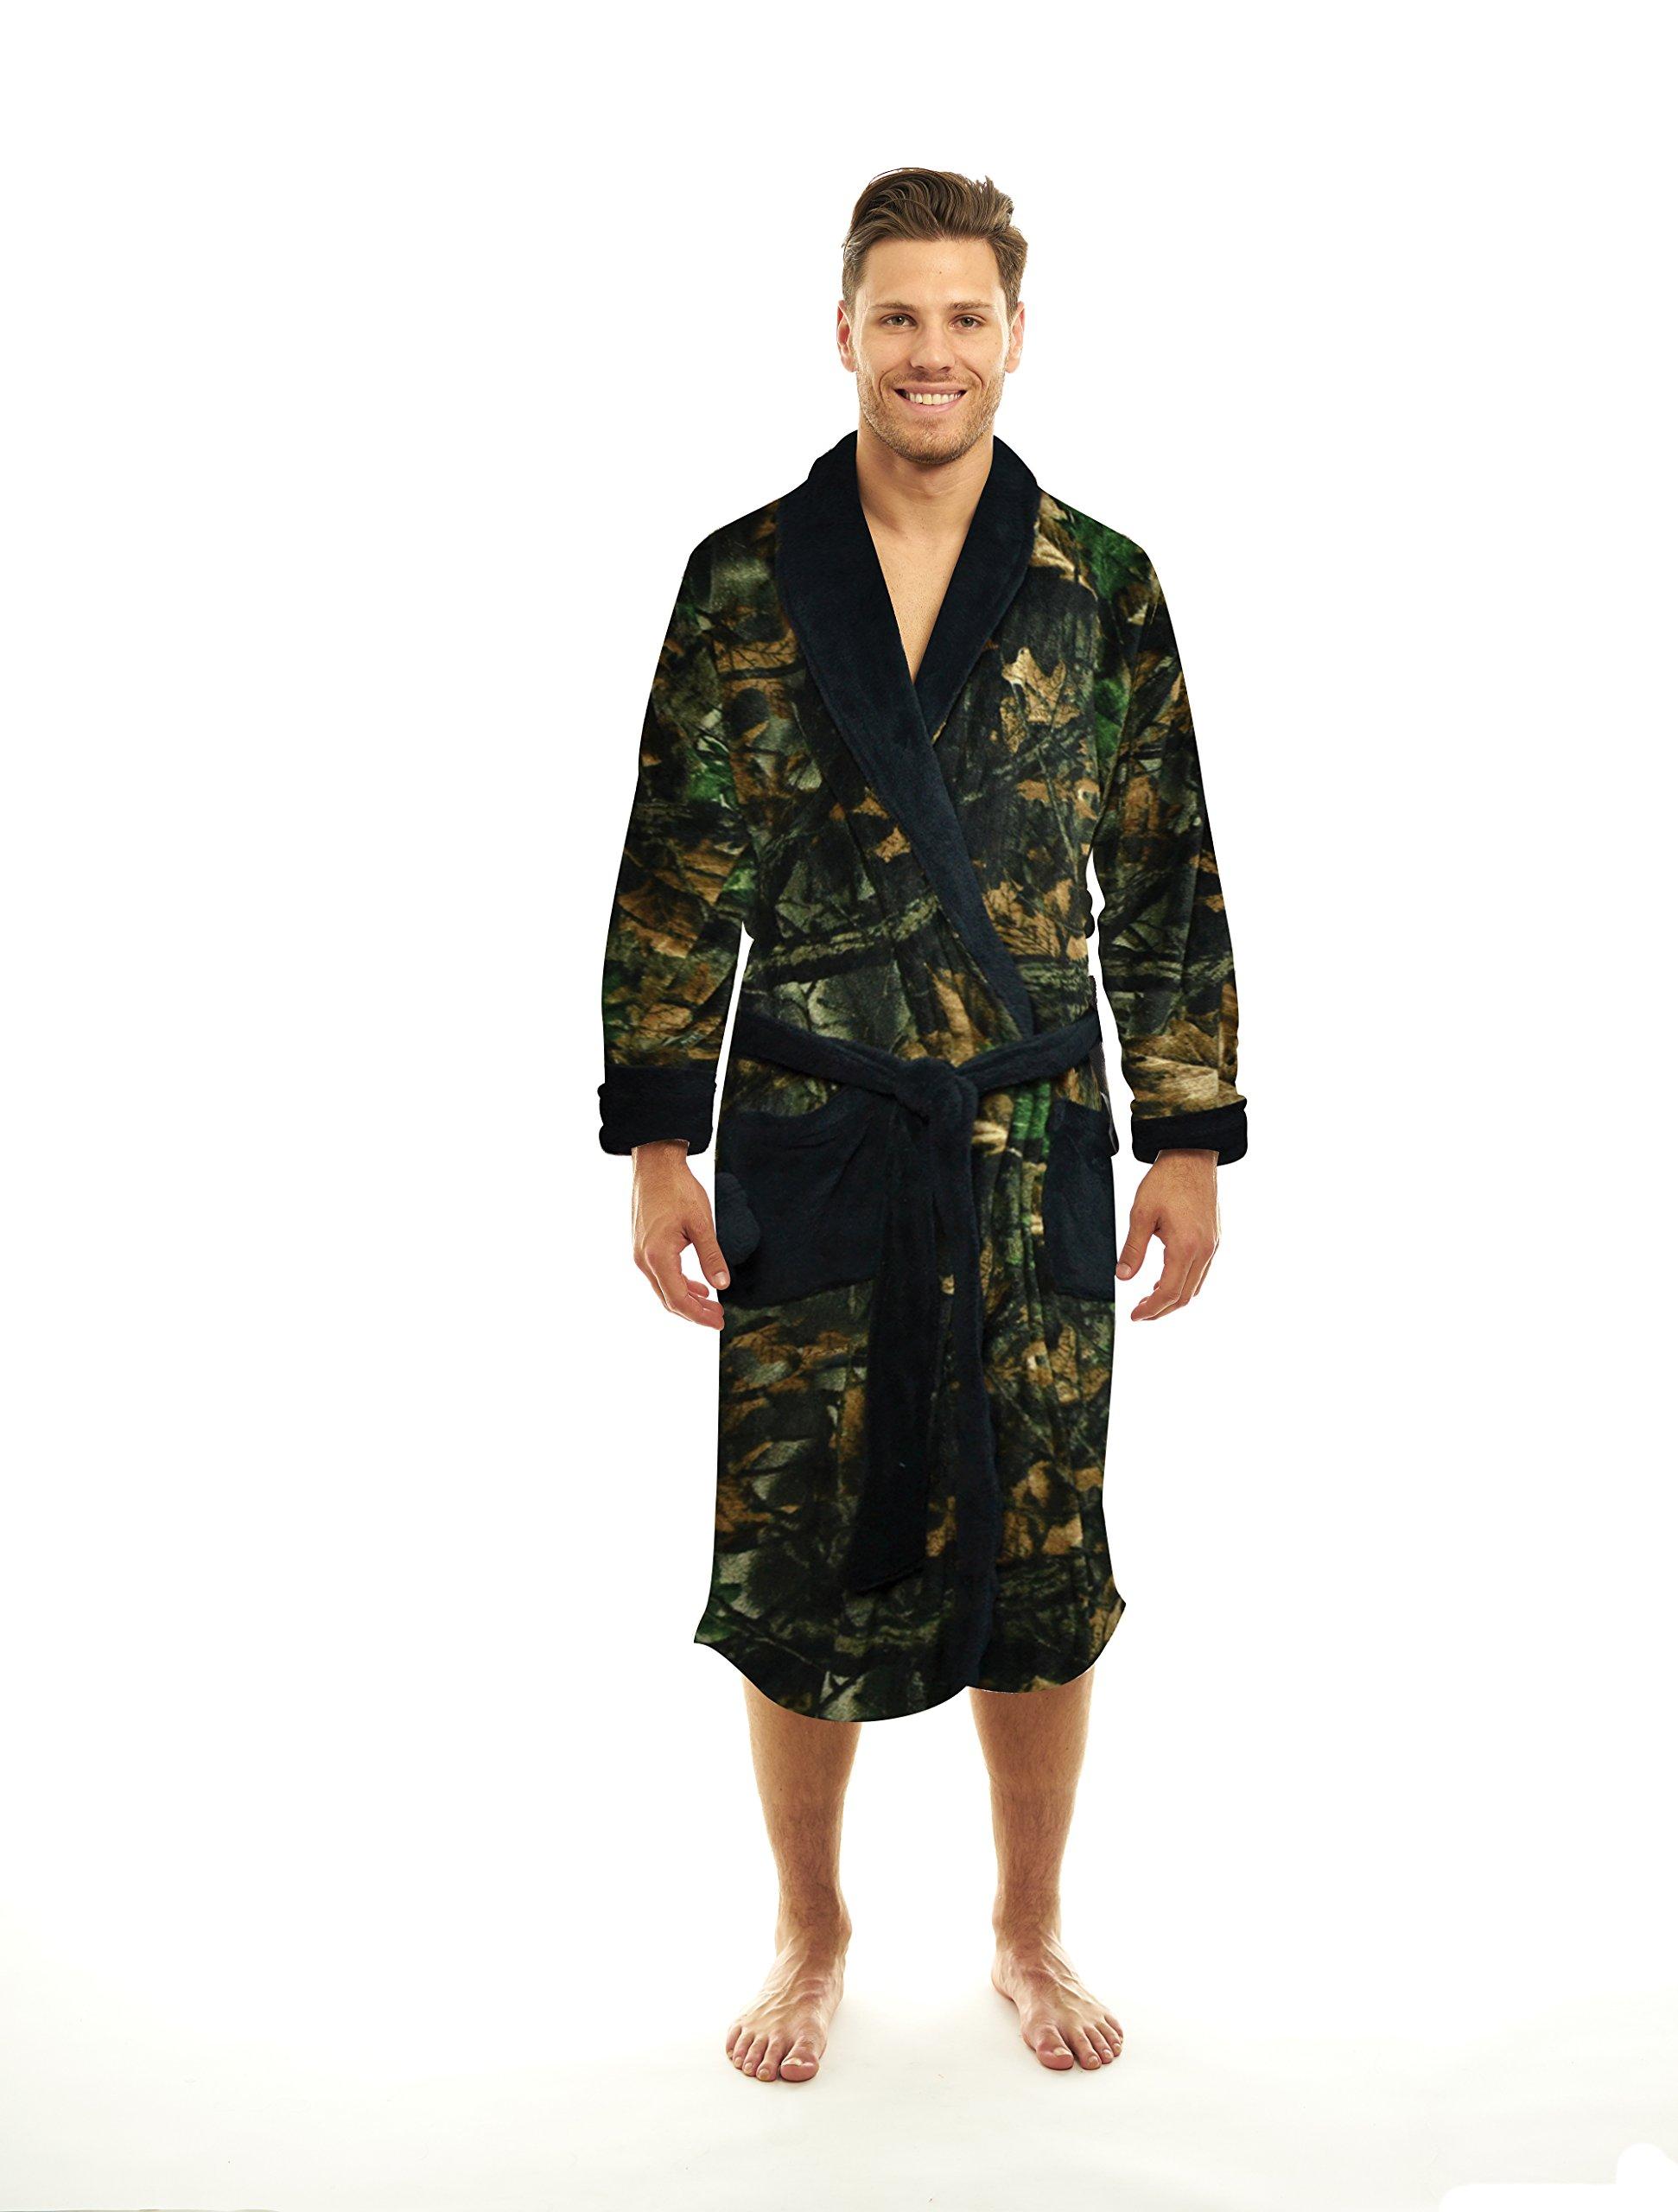 TrailCrest Coral Fleece Camo Lounge Robe (3X, Black)